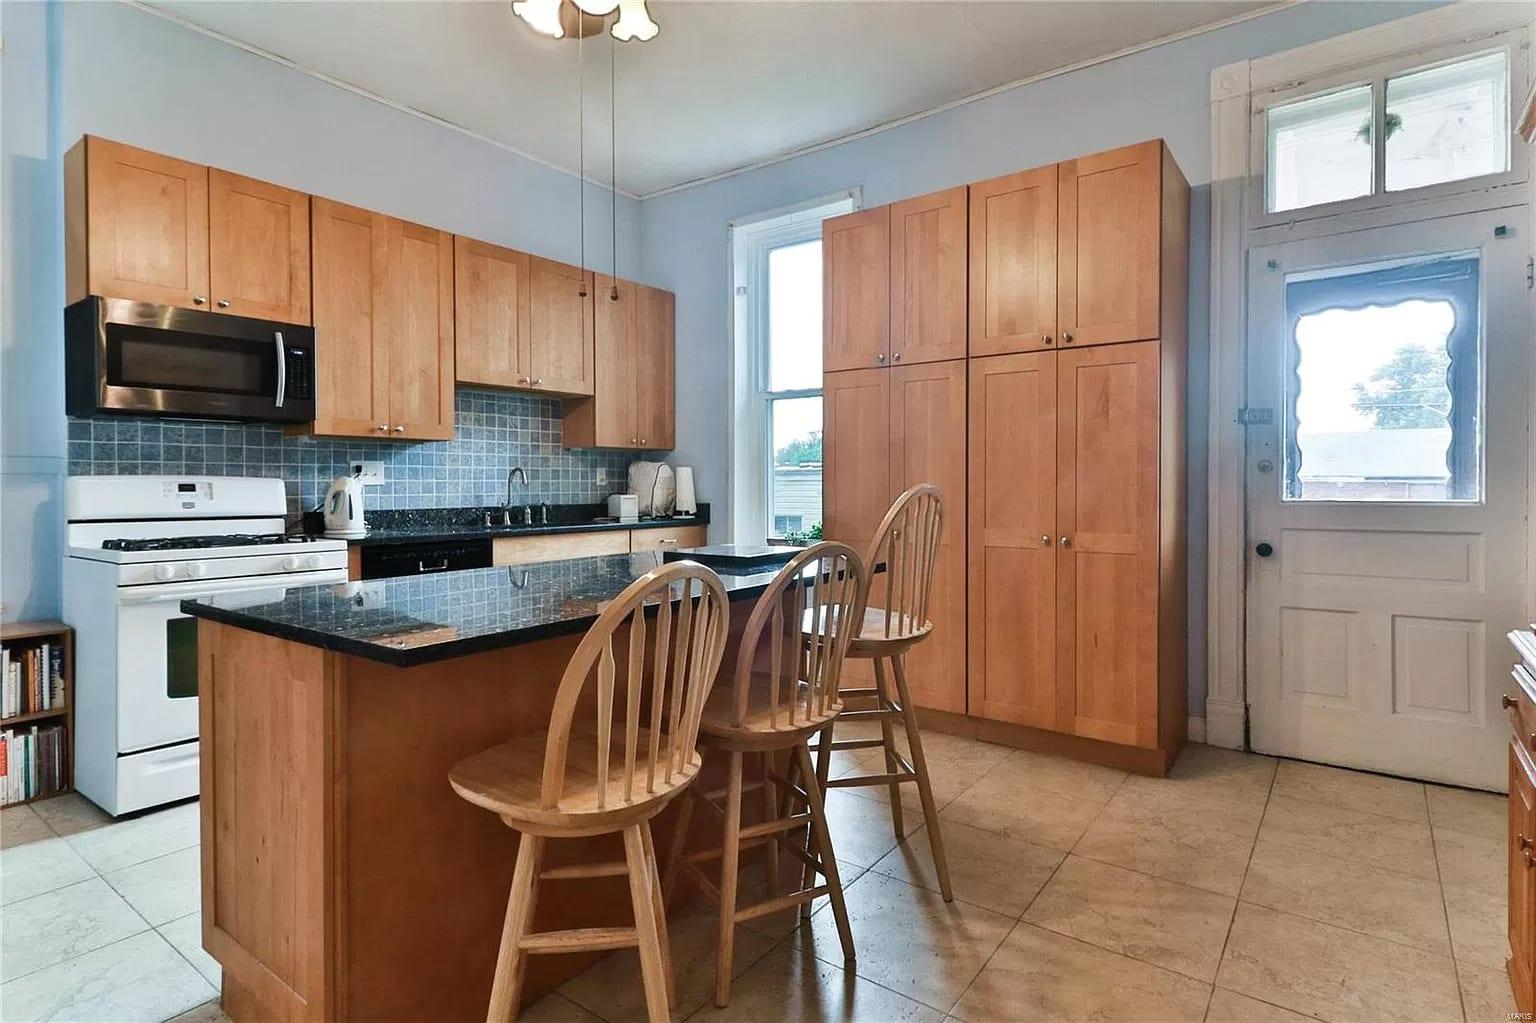 Real estate listing photos of 3516 Itaska Street.